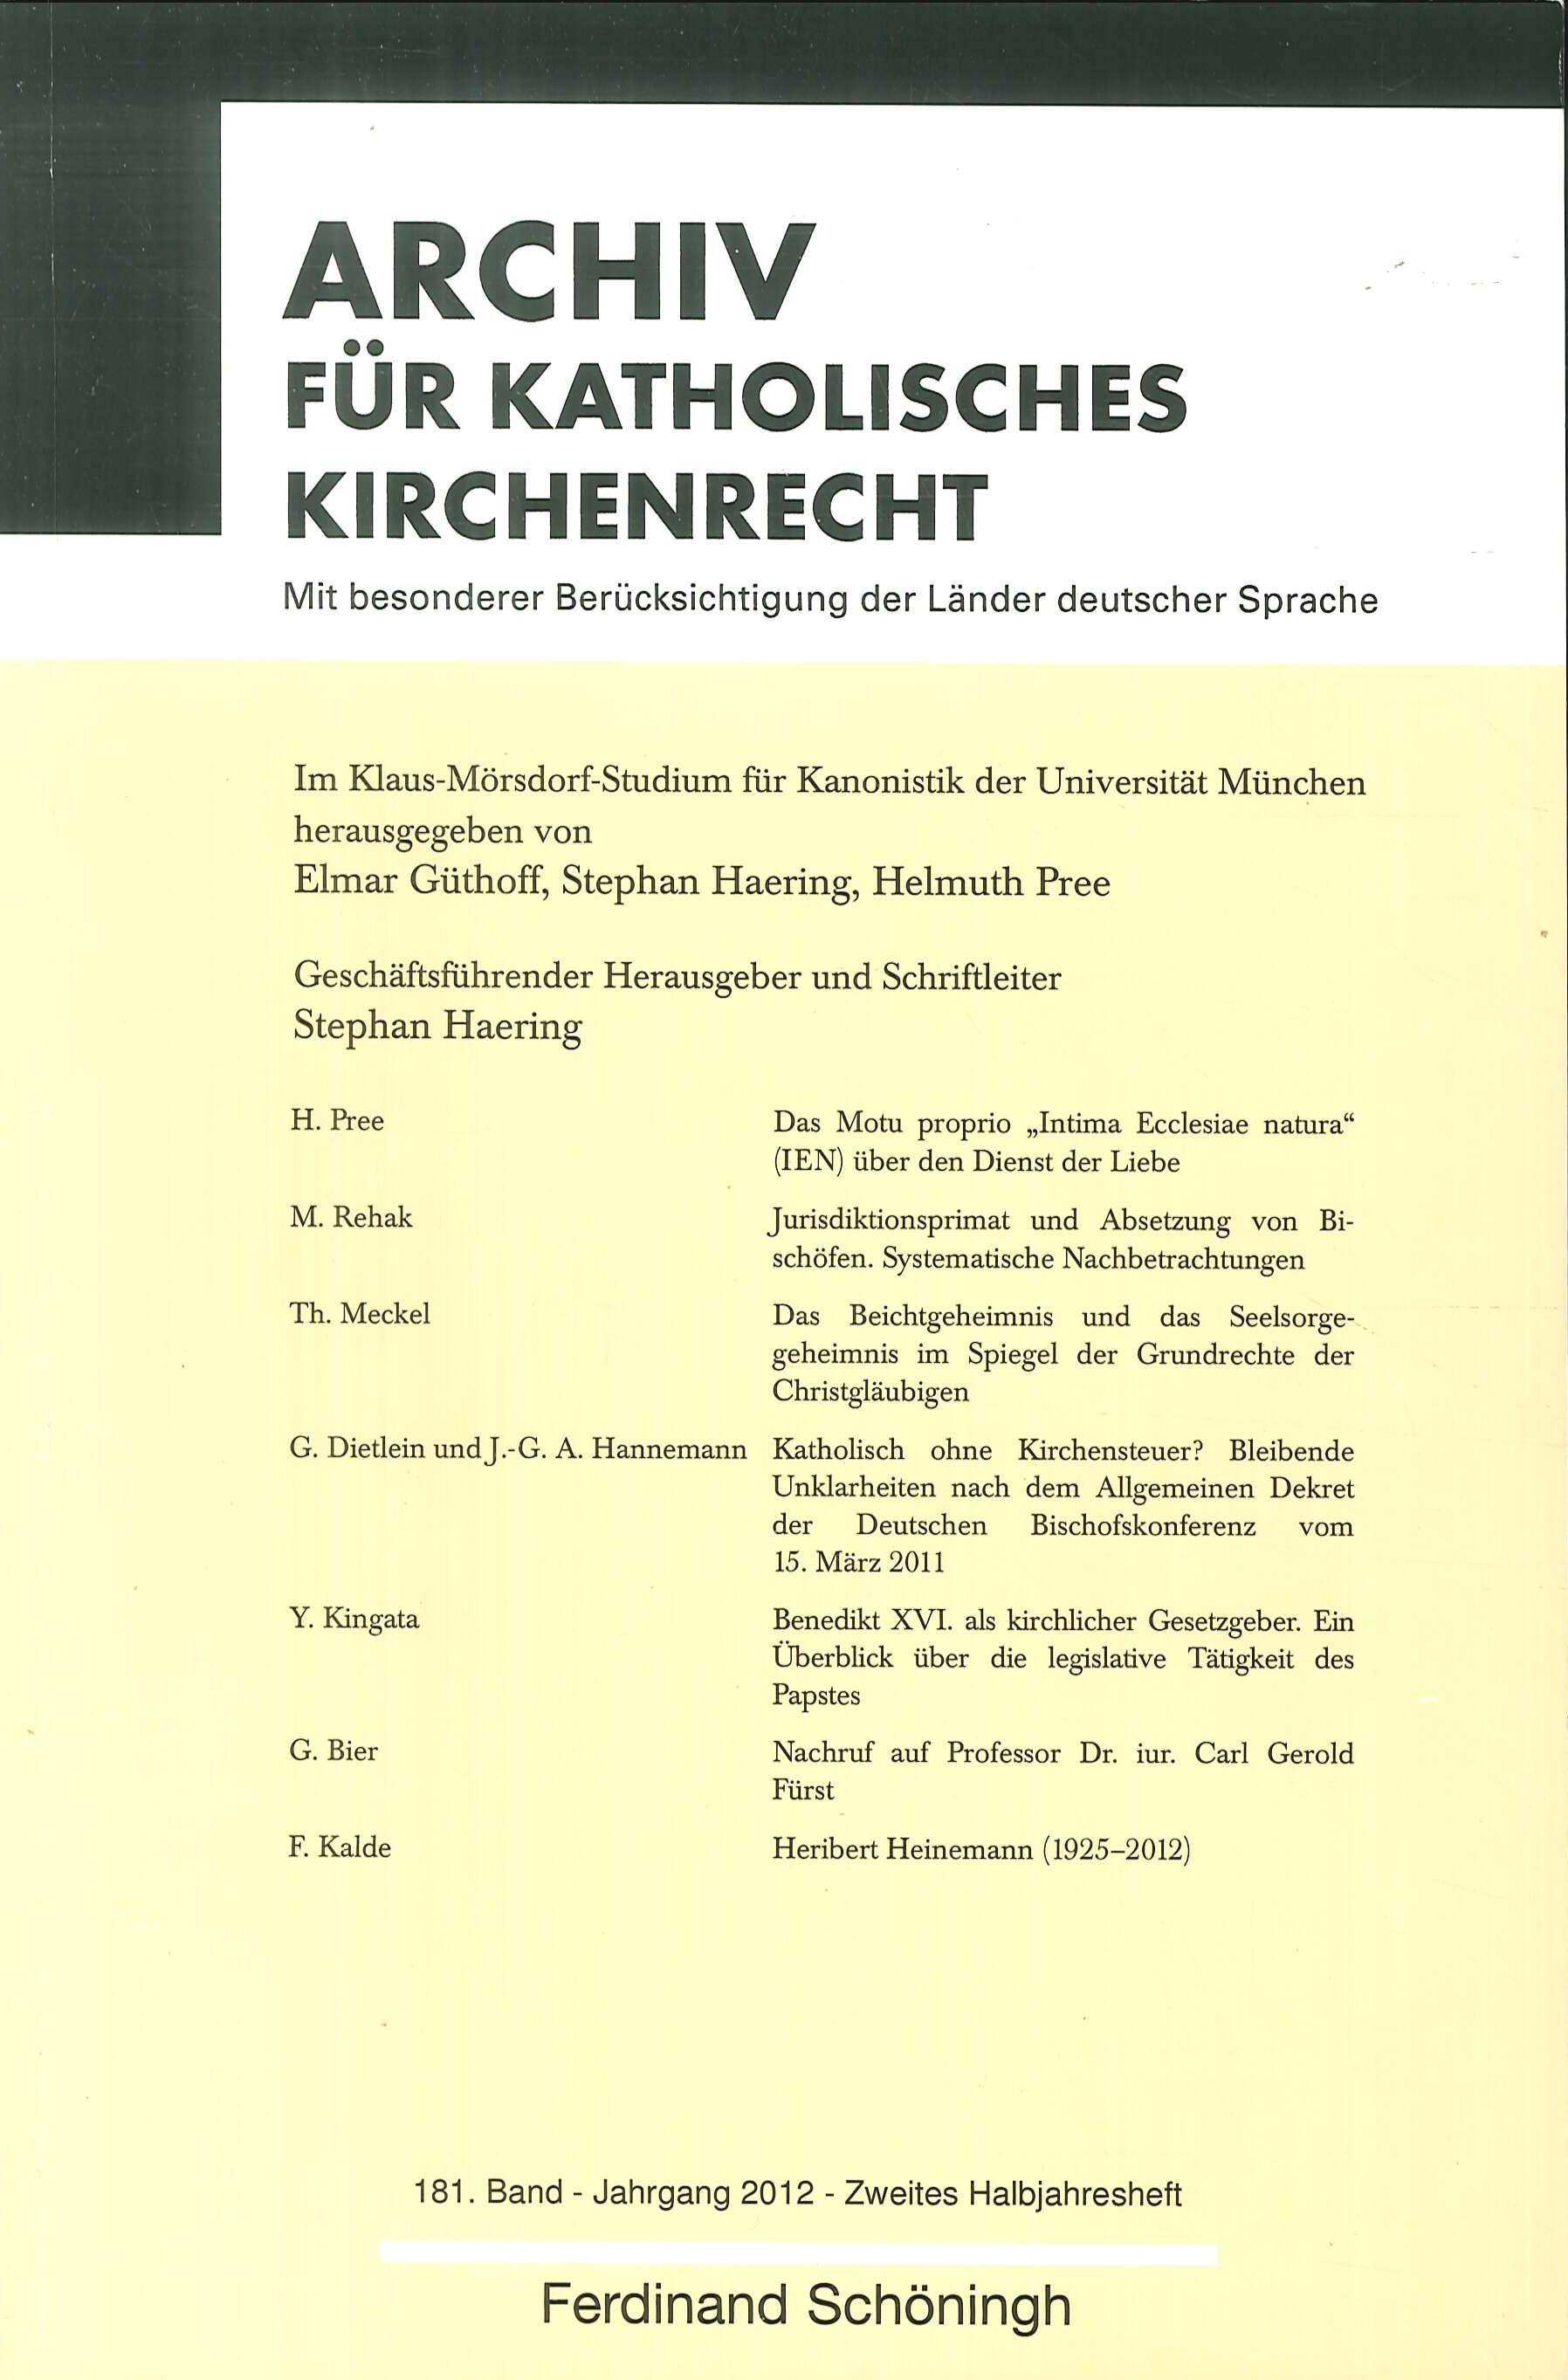 Archiv fuer katholisches Kirchenrecht 181. Jahrgang 2012 Heft 2